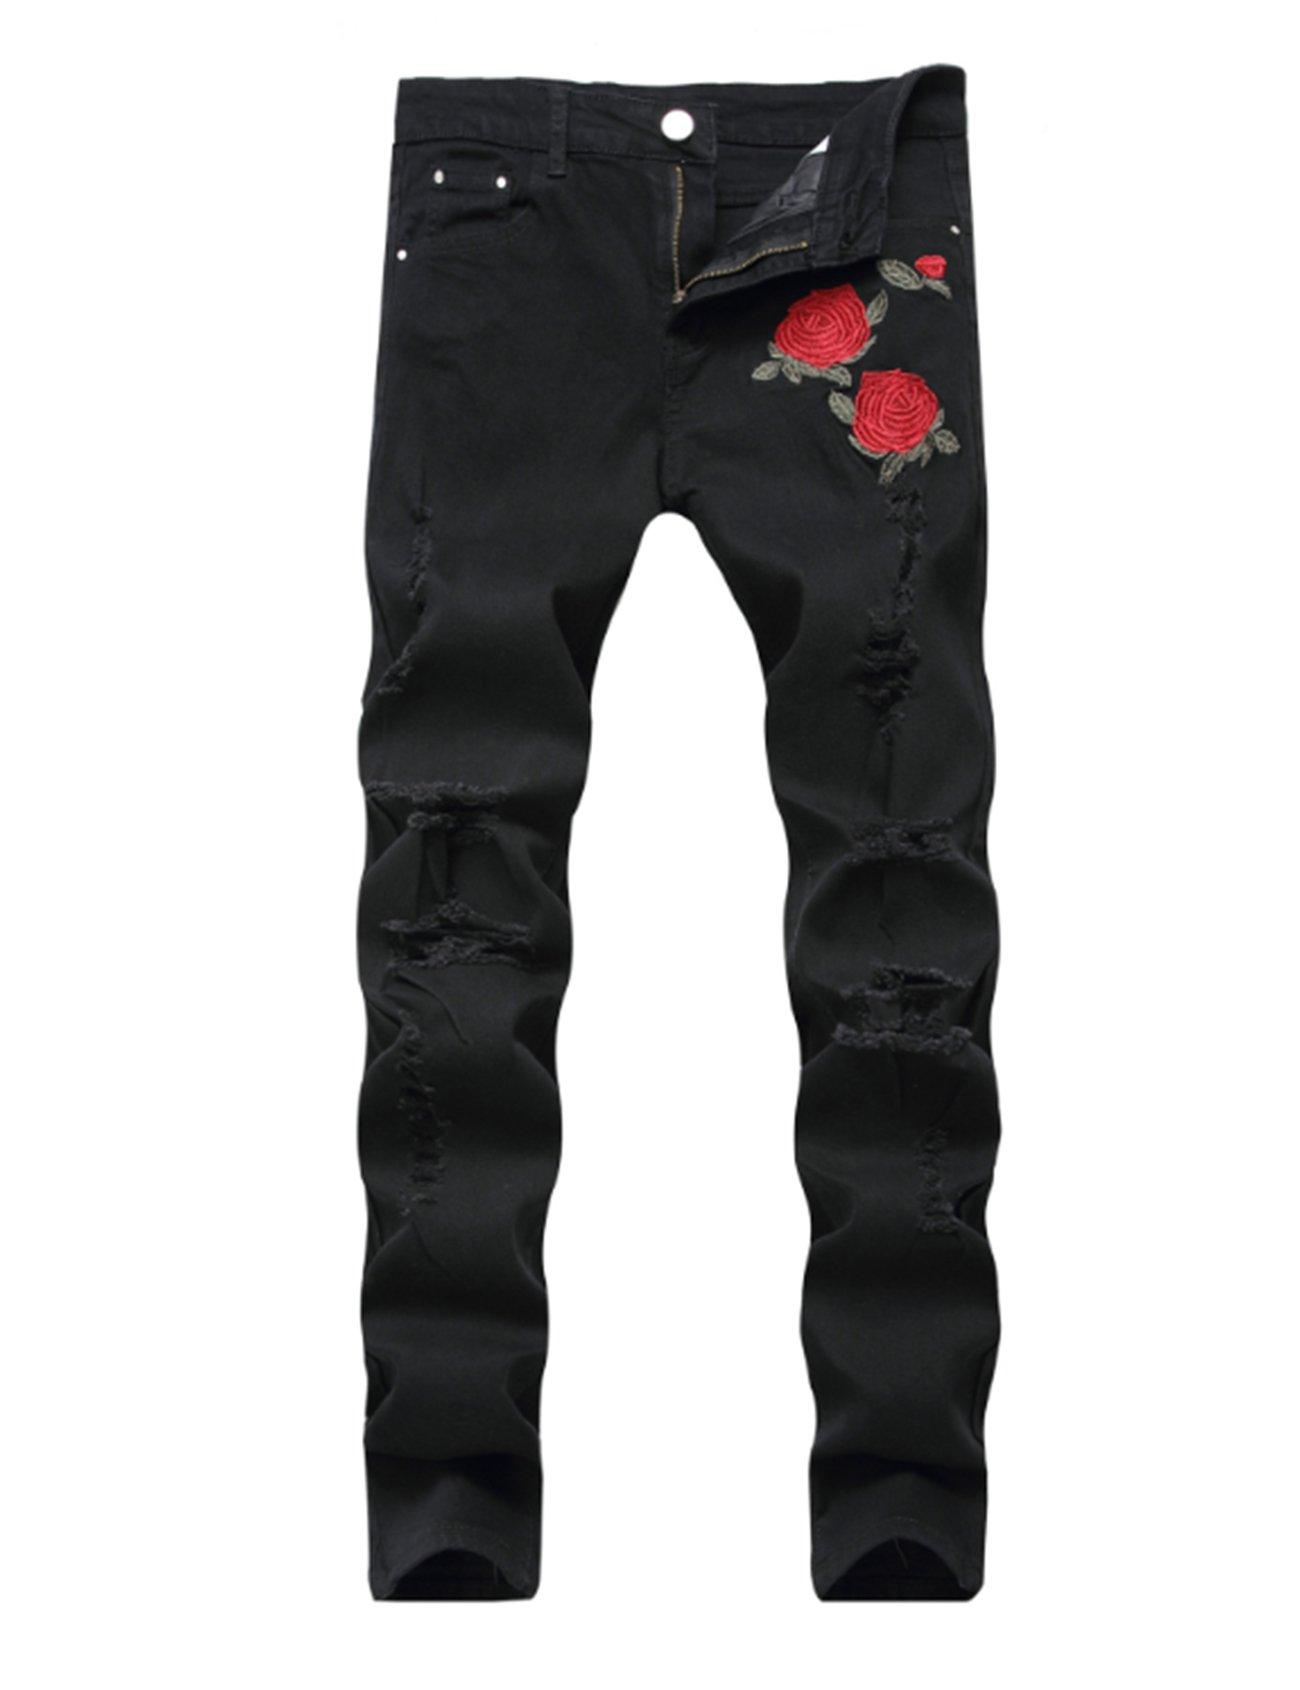 Bestgift Men's Distressed Normal Waist Embroidery Flower Jeans 32 Black